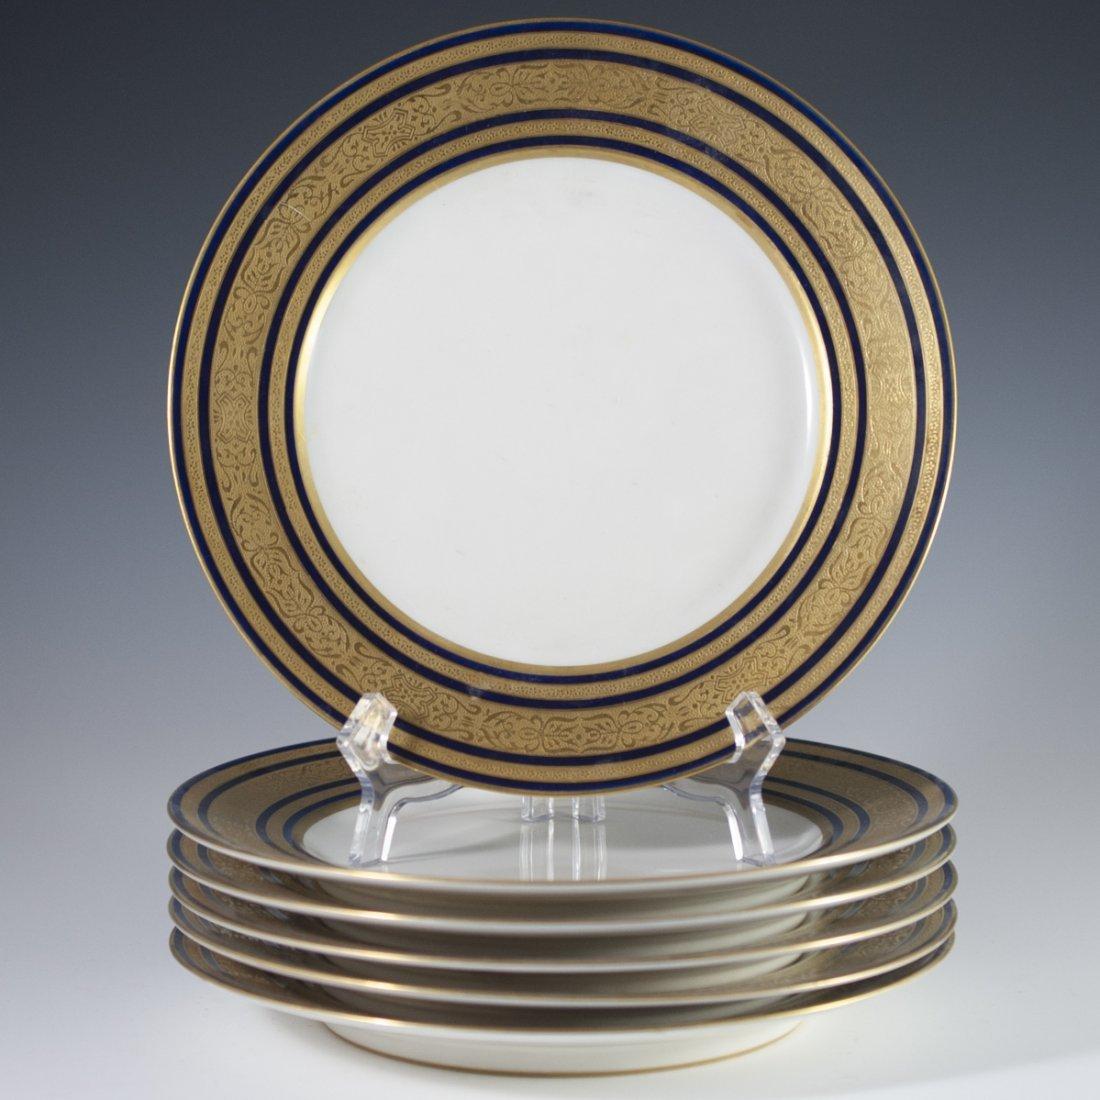 Charles Ahrenfeldt Limoges Cobalt Plates